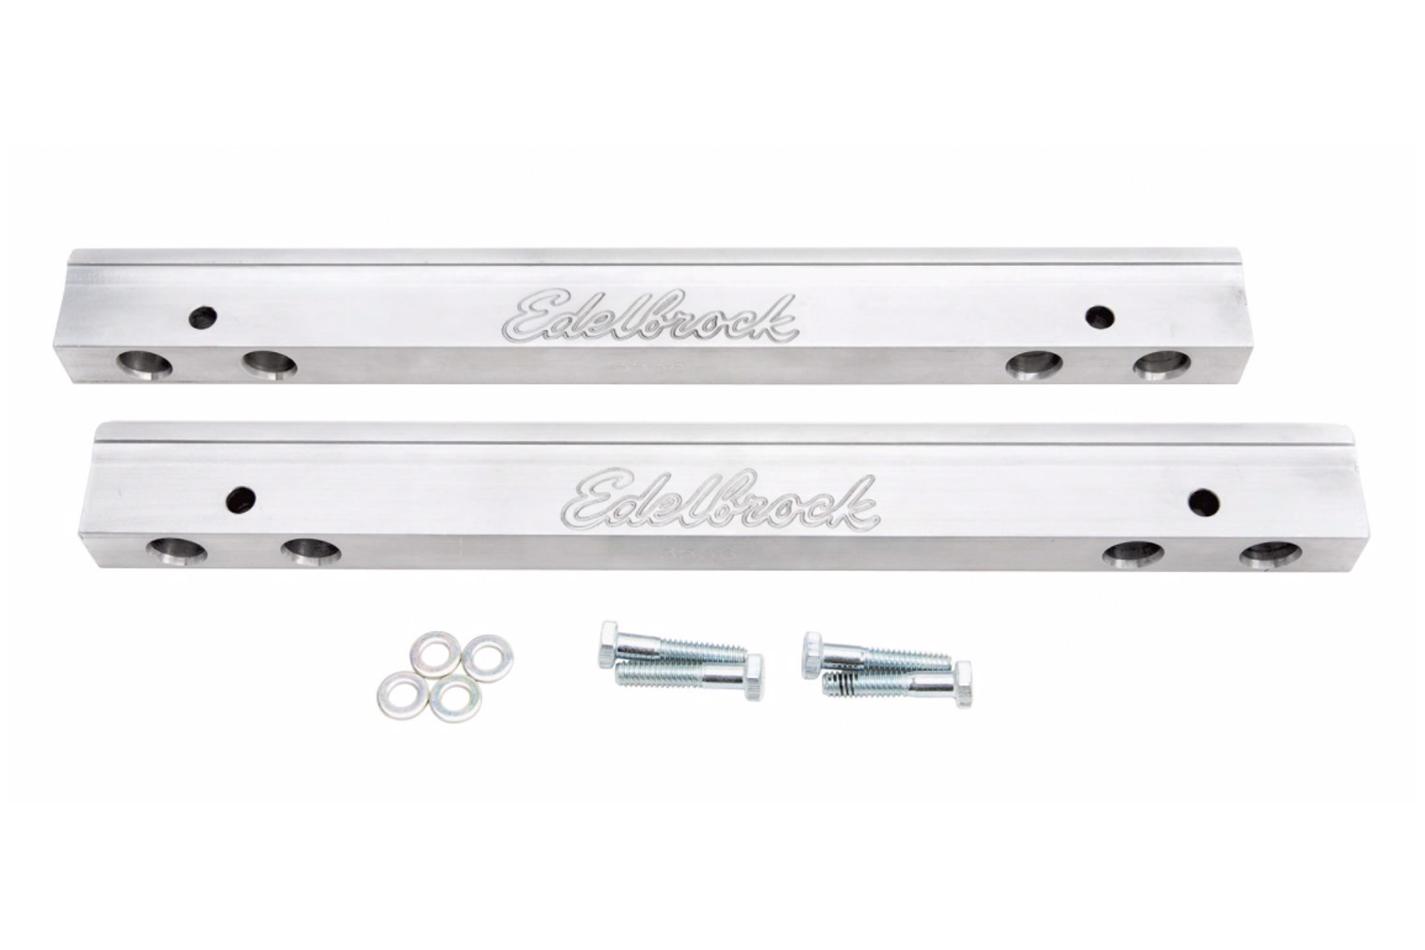 Edelbrock EFI Fuel Rail Kit - for 5056 Pontiac Intake